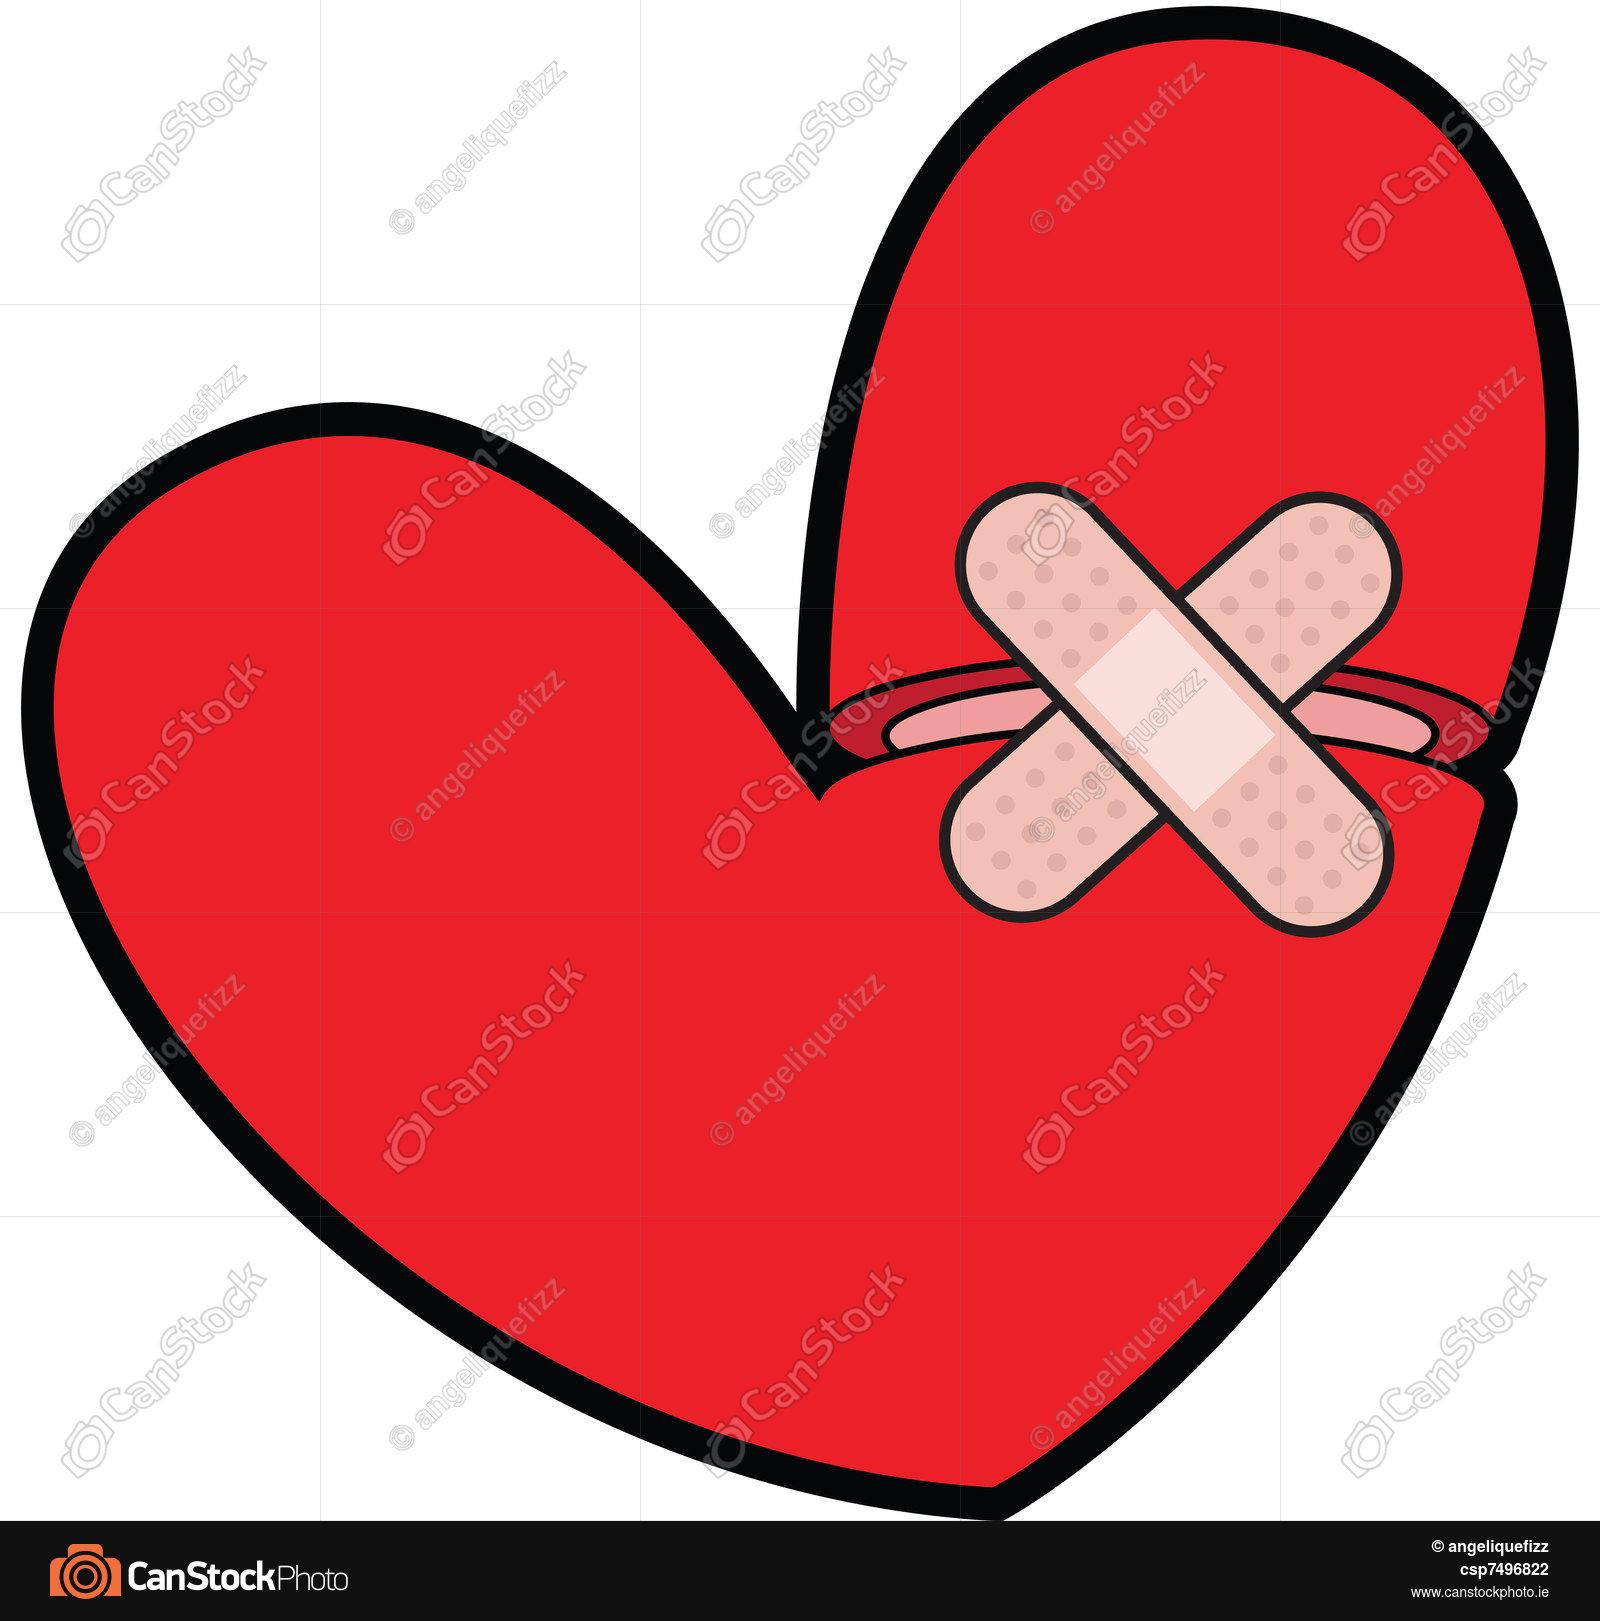 1600x1621 Broken Heart With Bandaid. Mending A Broken Heart With A Clip